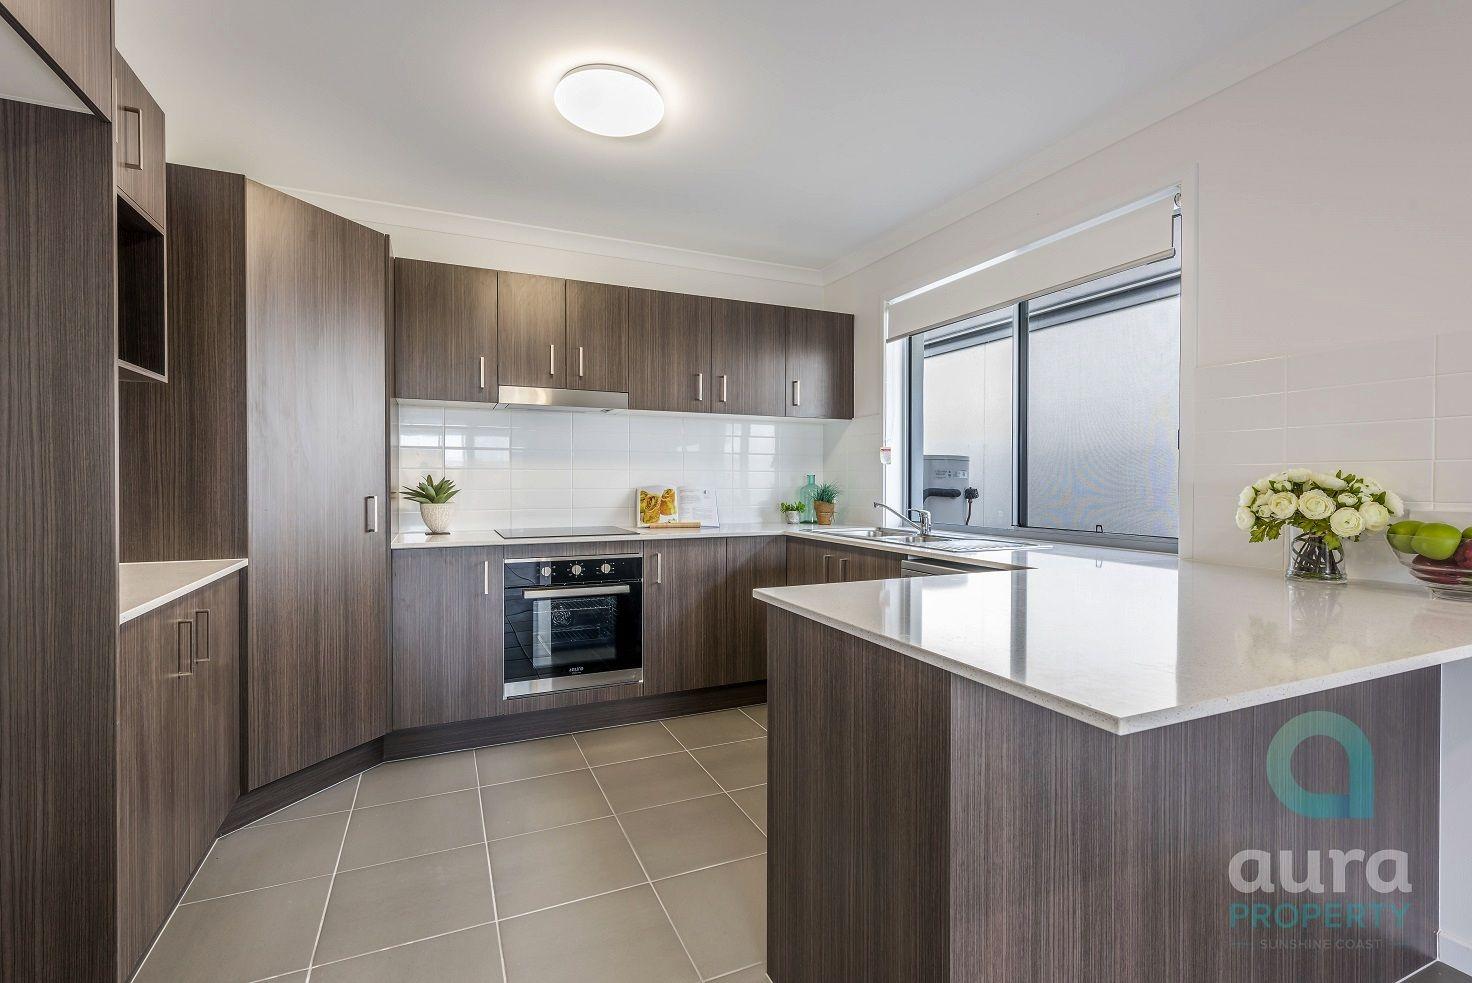 104 Steiner St, Caloundra West QLD 4551, Image 0